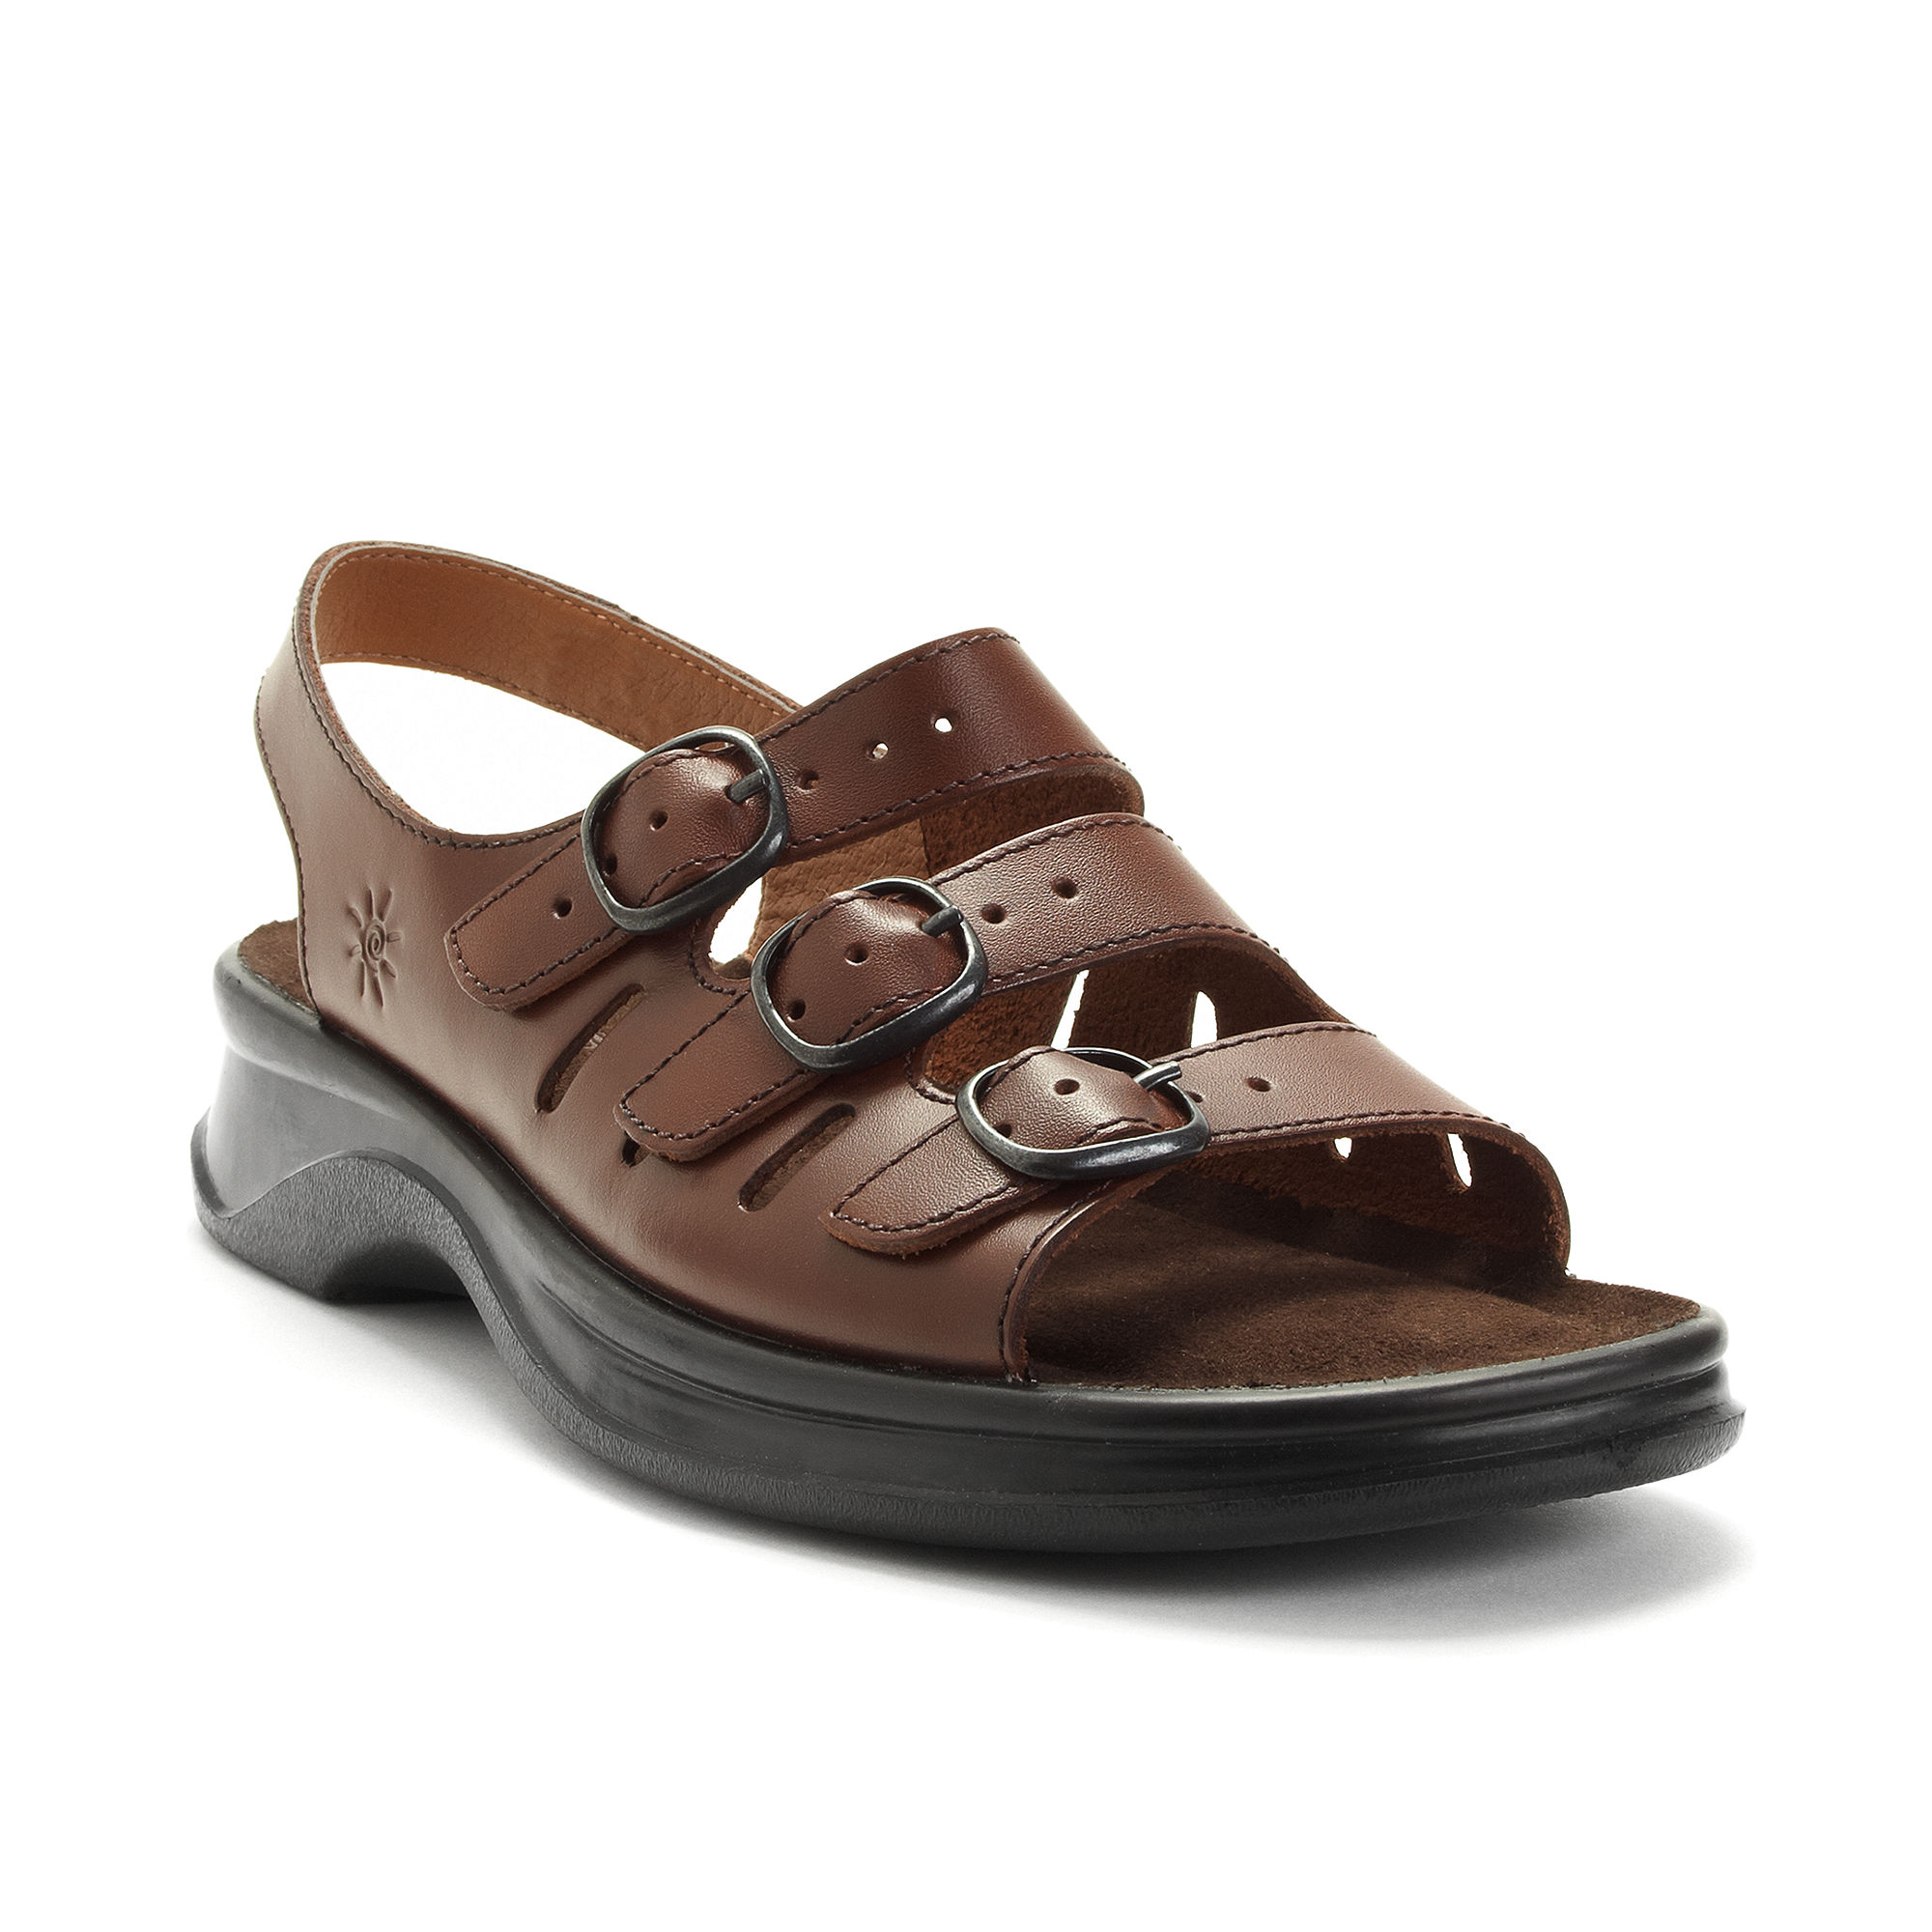 26a604868b7 Lyst - Clarks Sunbeat Sandals in Brown